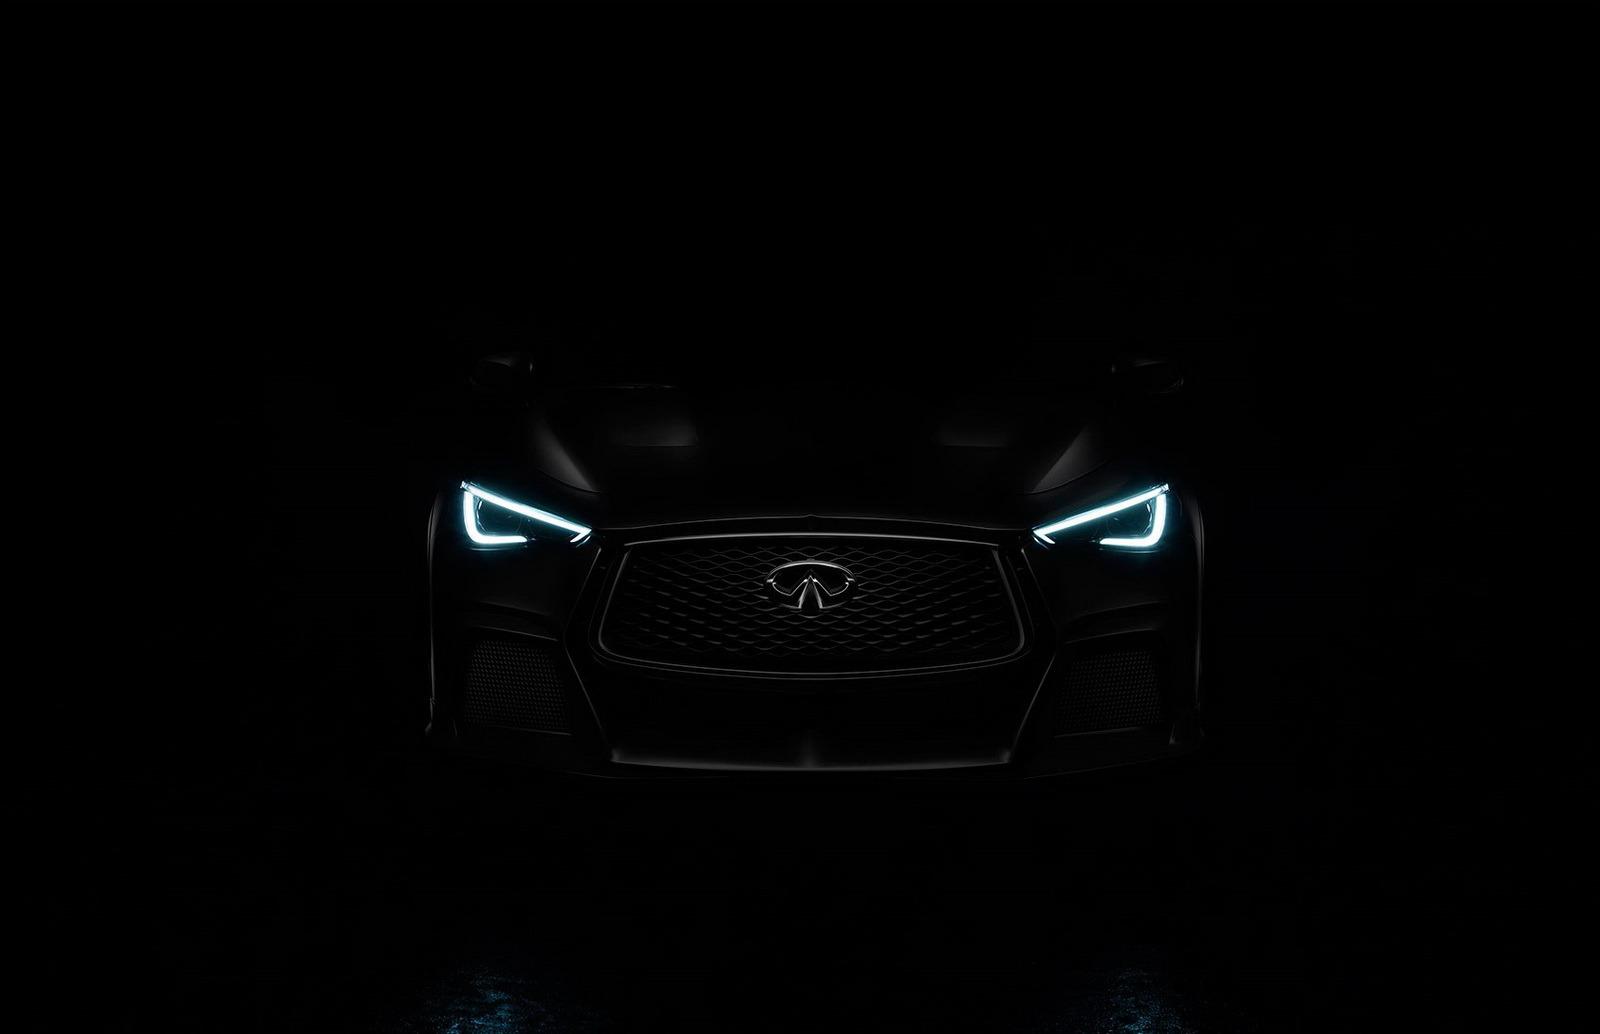 Infiniti Q60 Black S bude mať KERS ako F1